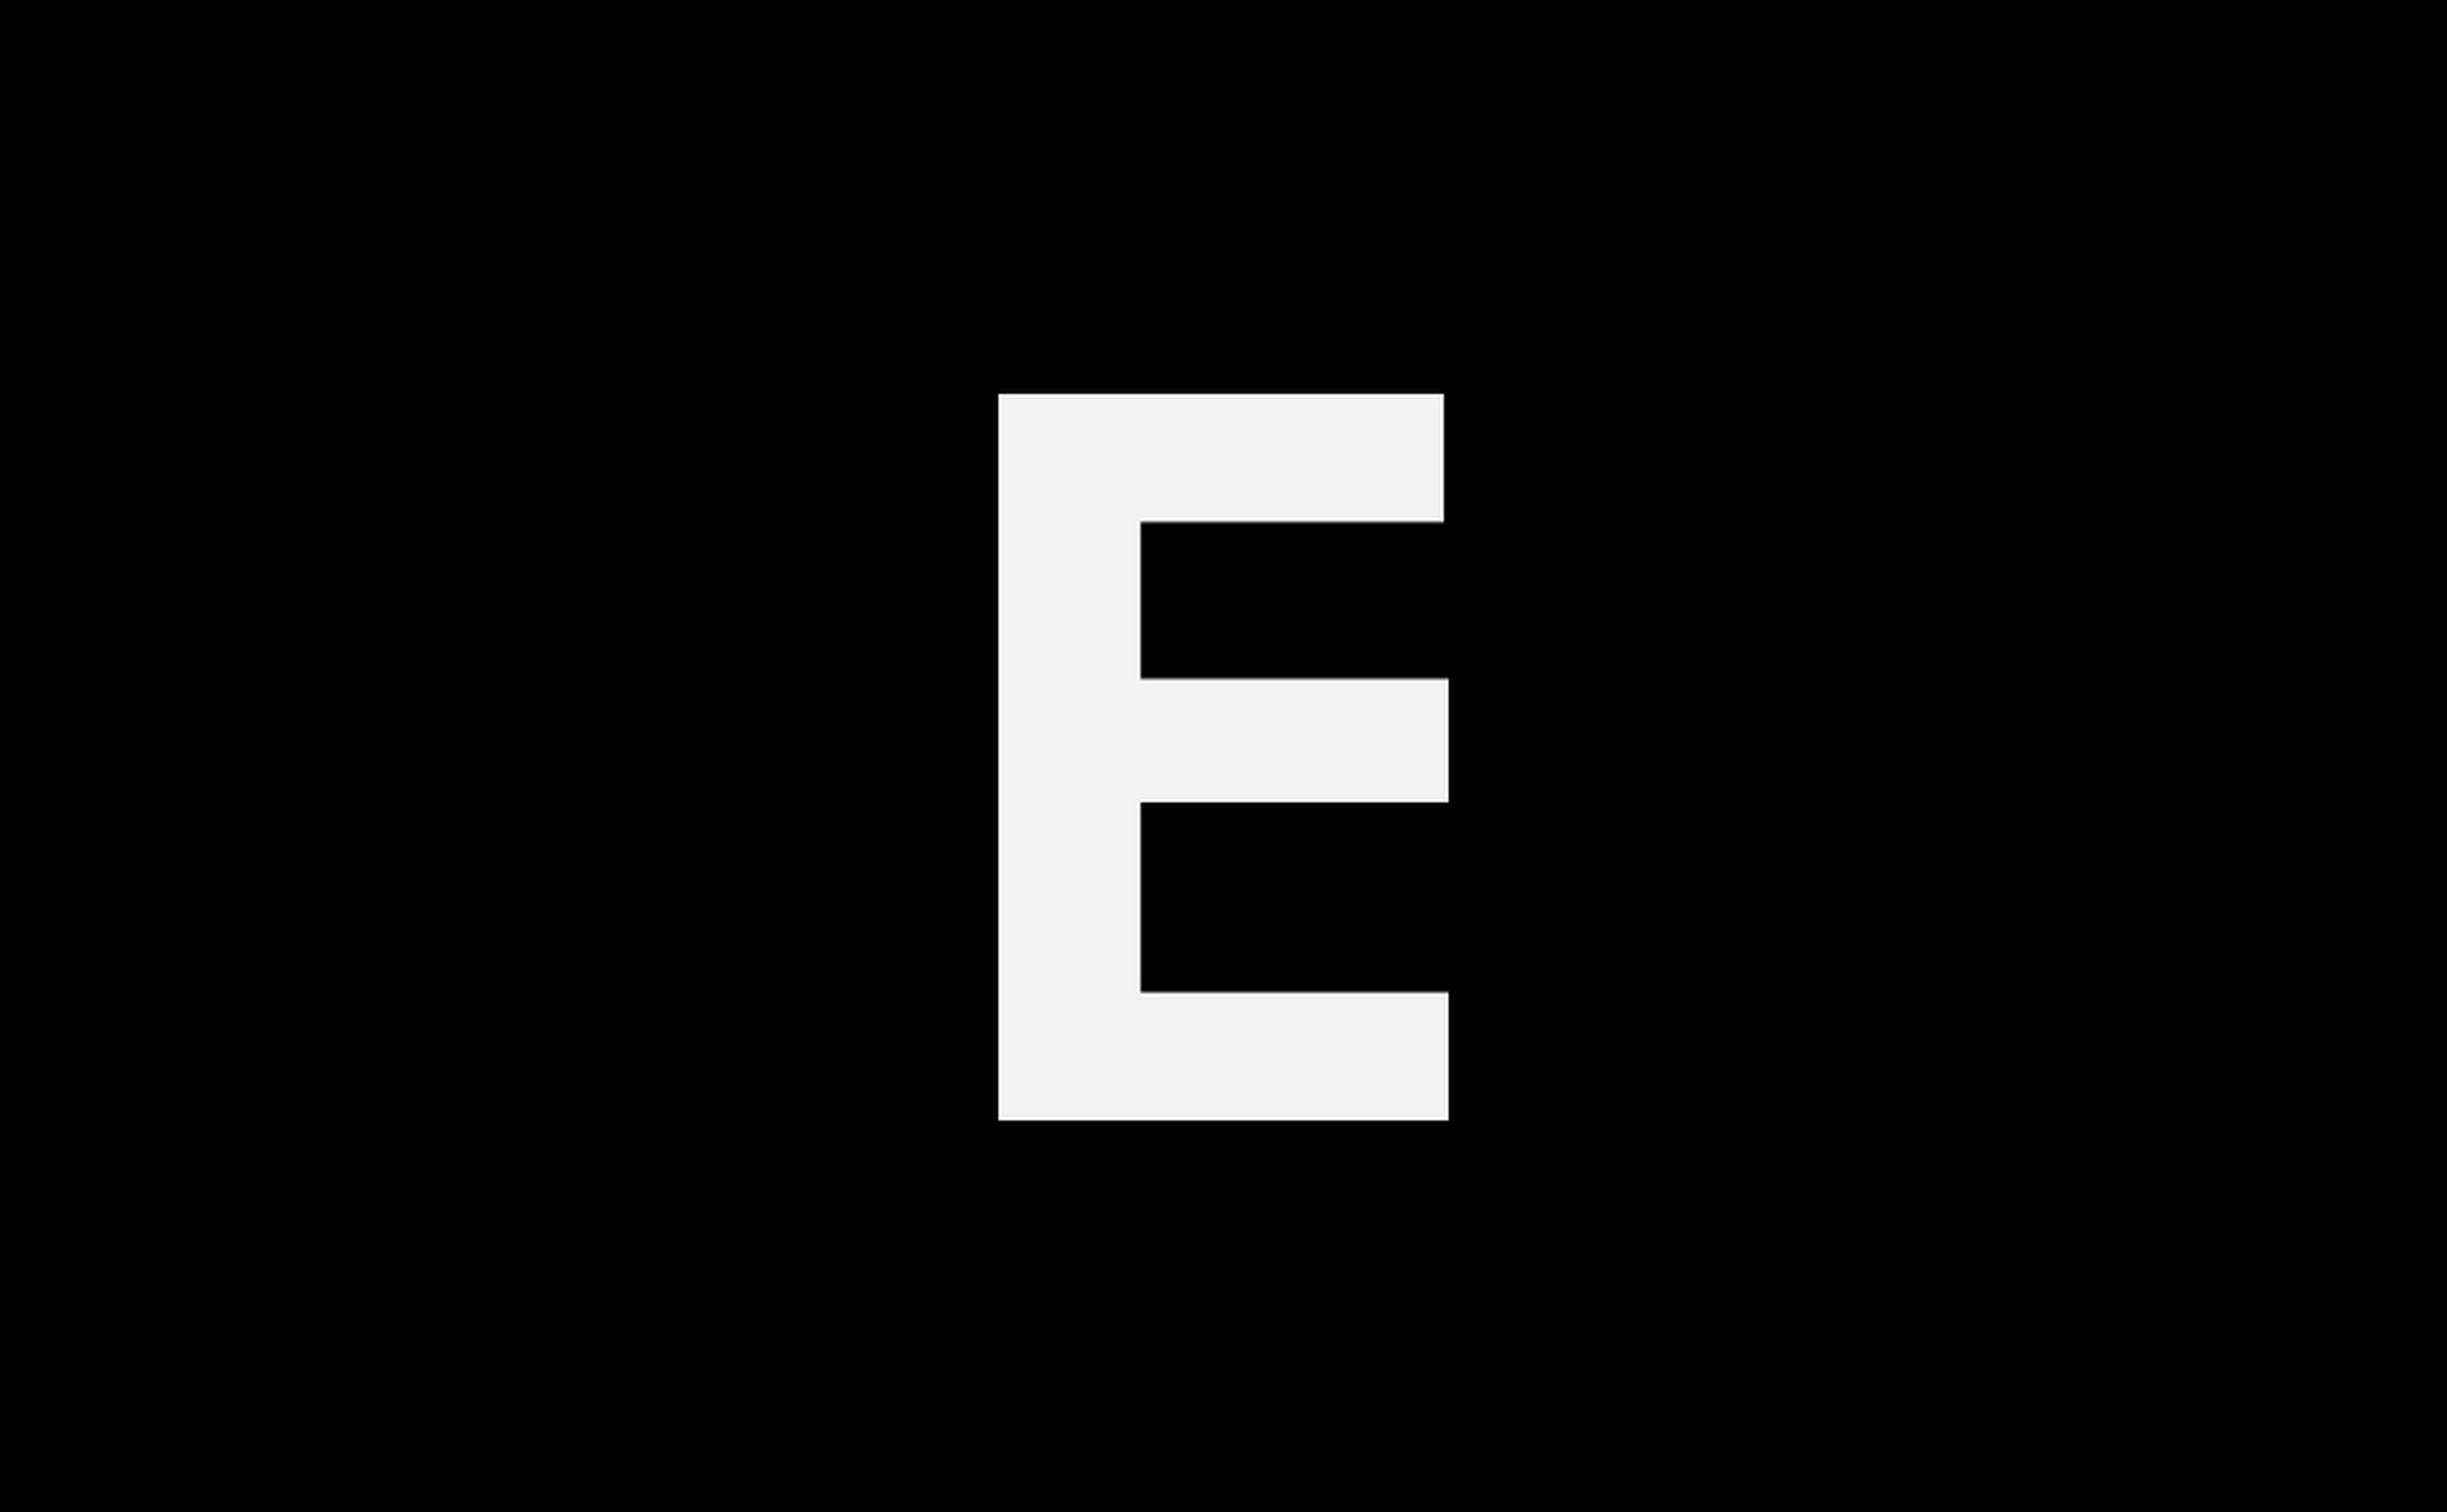 Eye4photography  Shoe Still Life Light And Shadow EyeEm Best Shots Cinematography EyeEmBestPics EyeEm Best Edits Chukka Chukkaboot Florsheim Florsheim Imperial Fashion Vintage Shoes Old Shoes